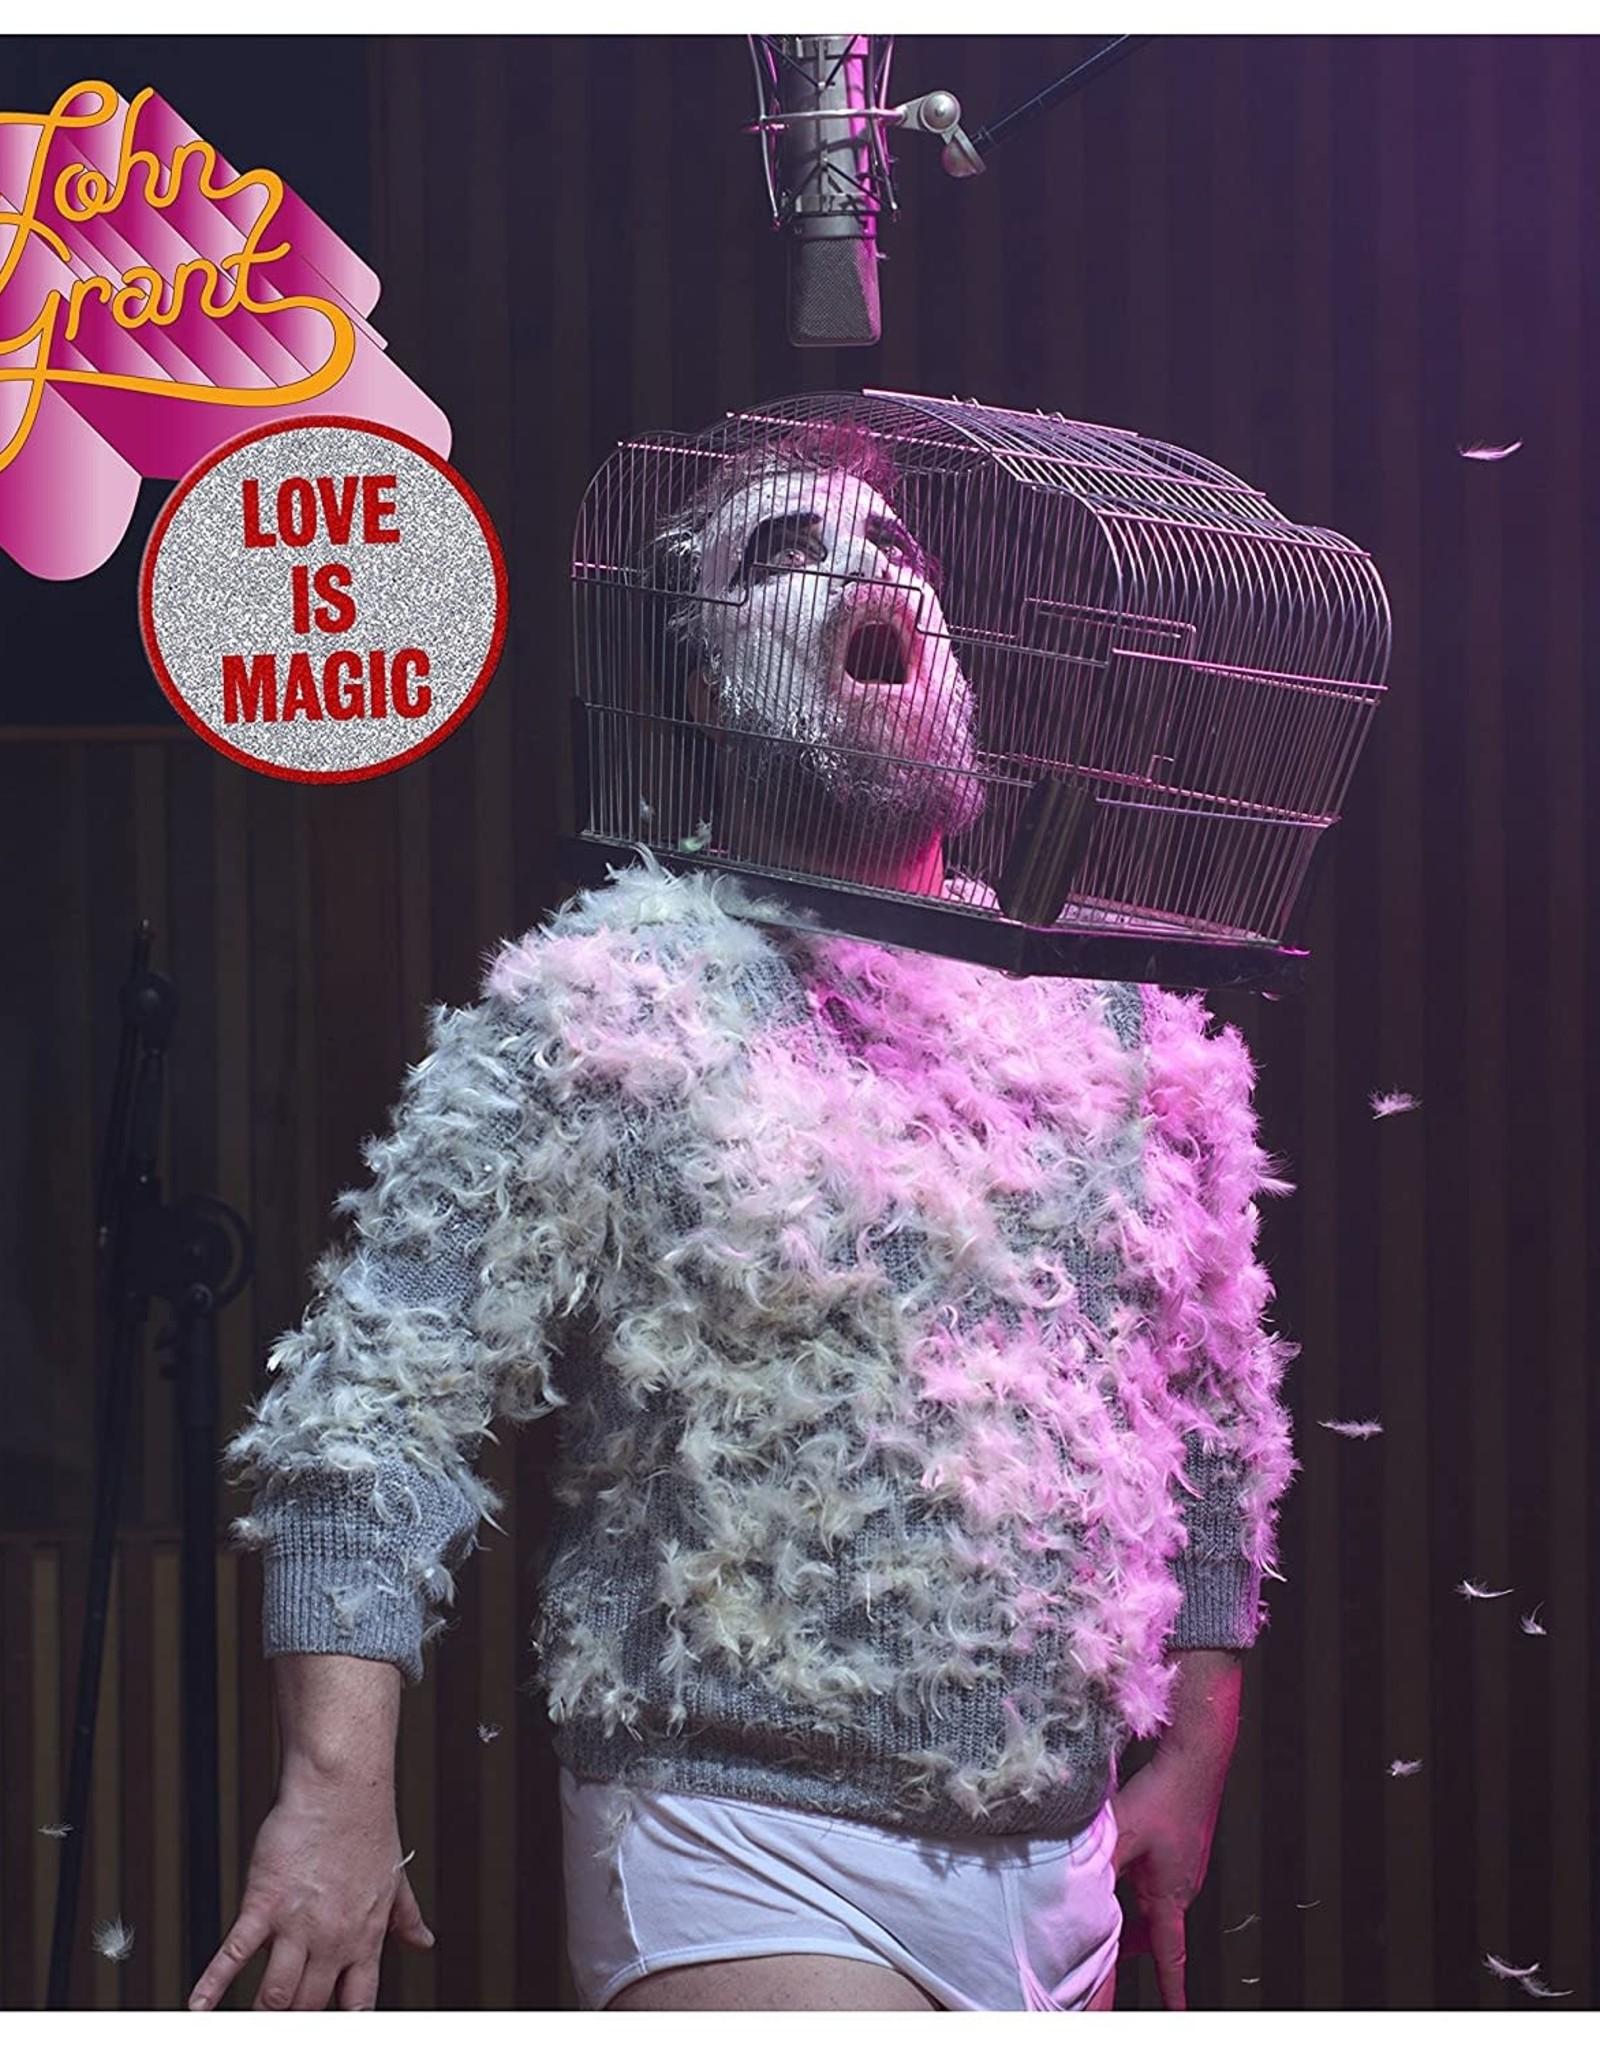 John Grant - Love Is Magic (Deluxe)